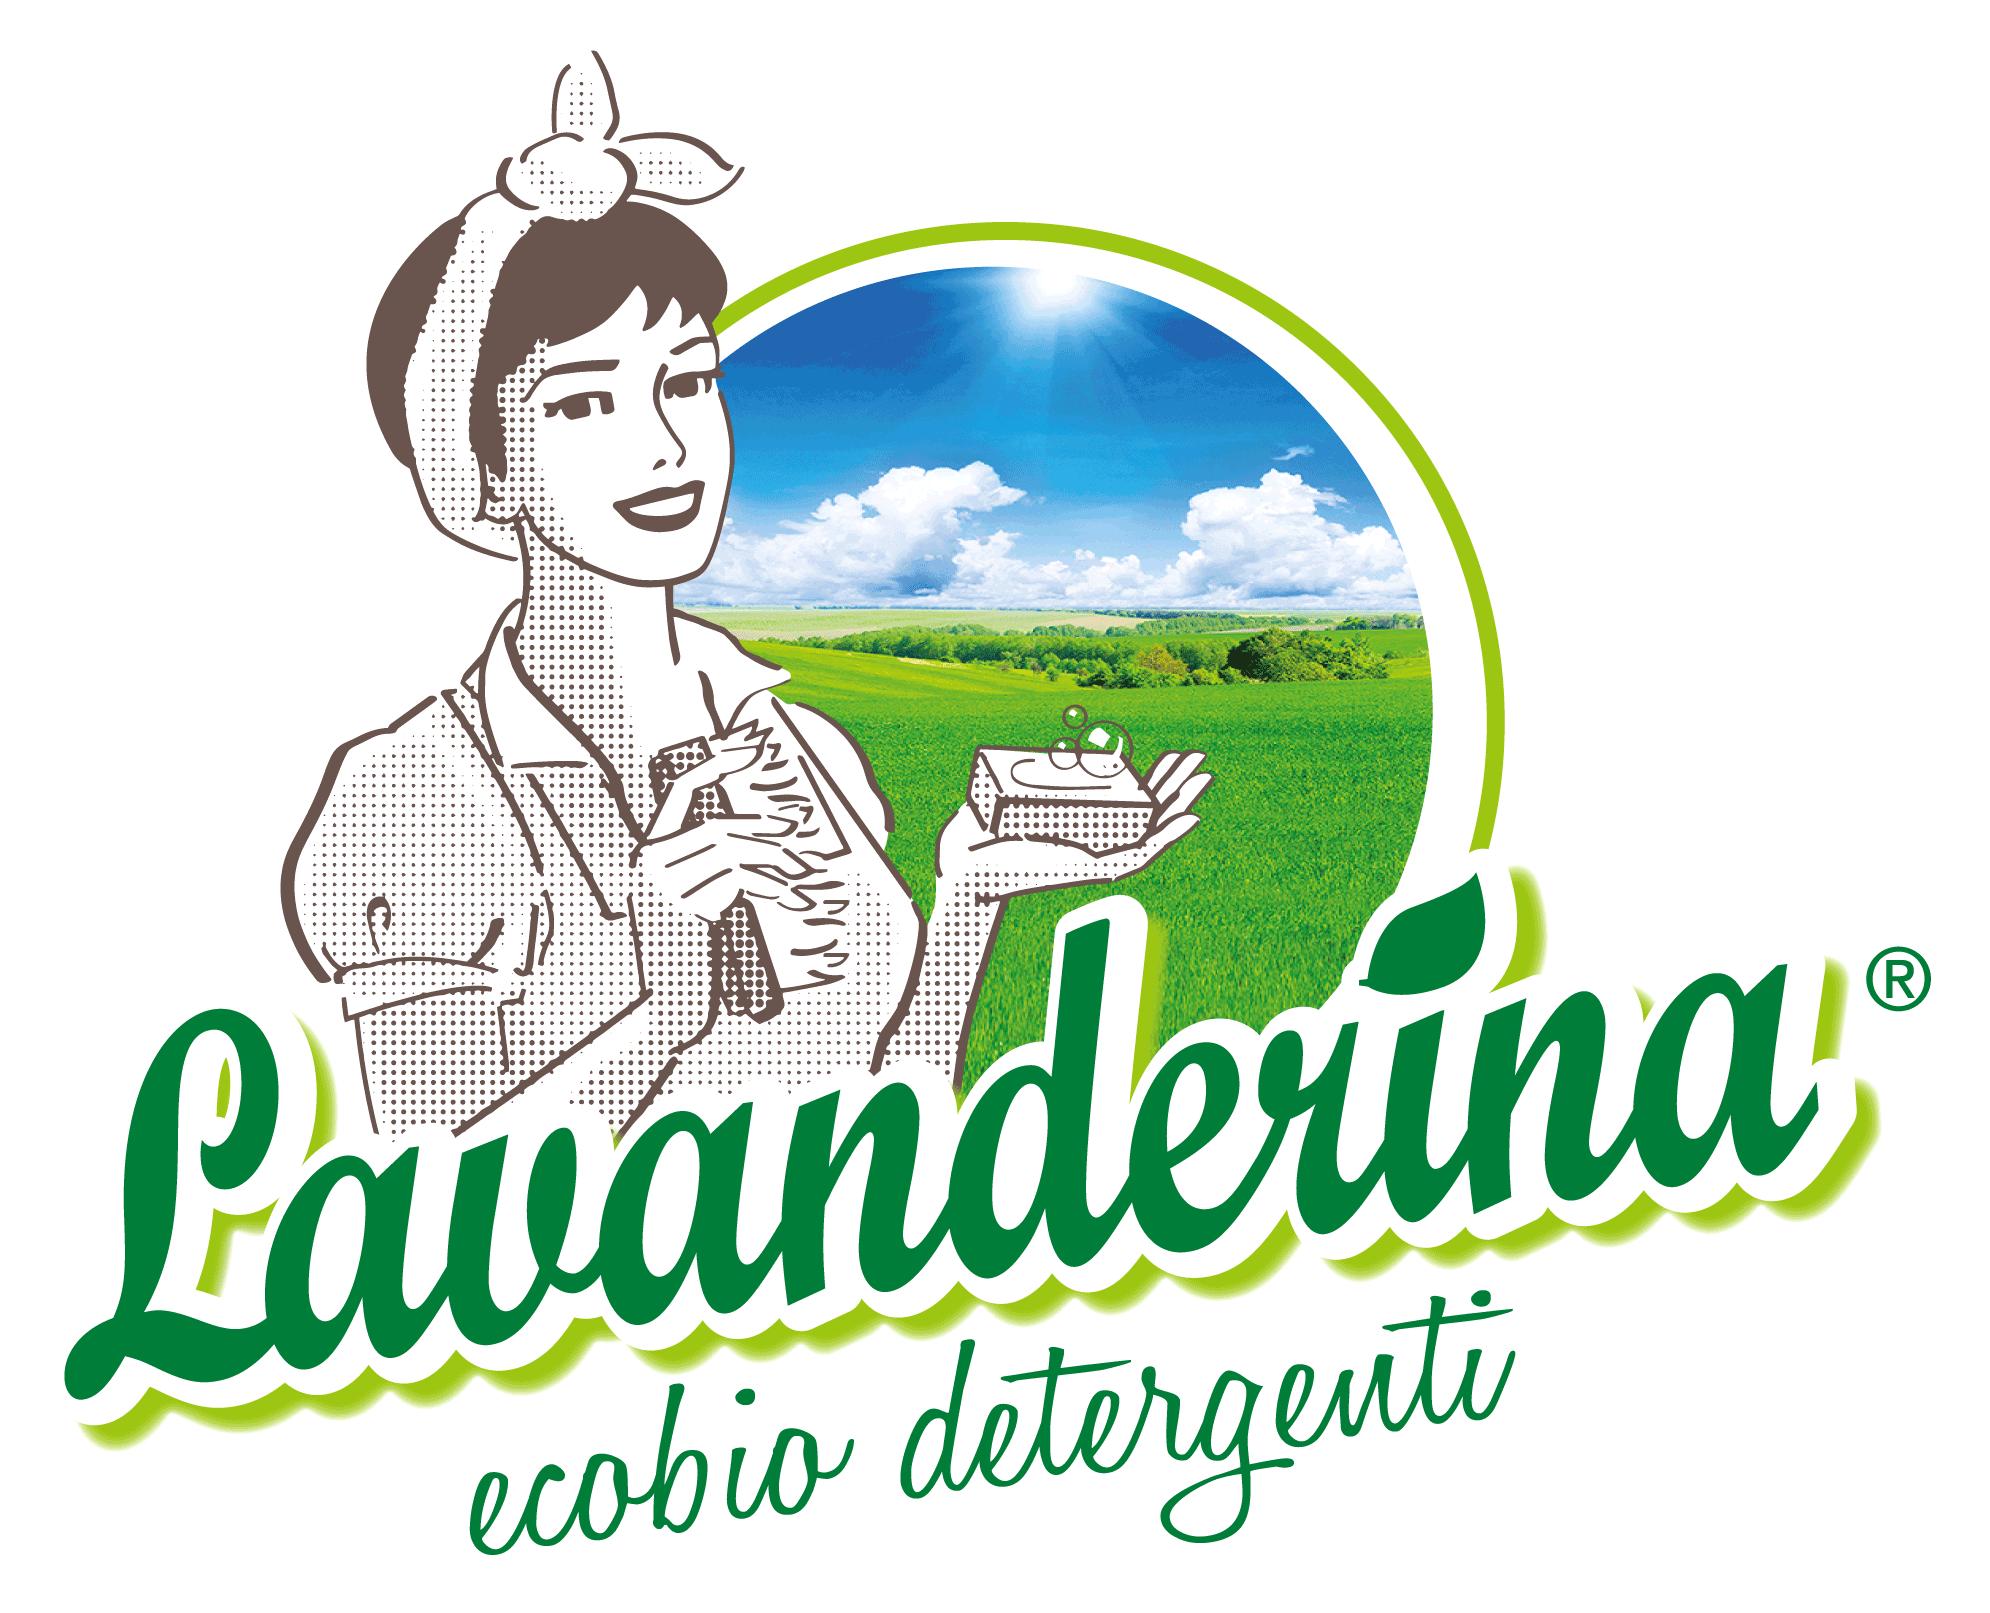 Ecobio detersivi naturali artigianali e sostenibili